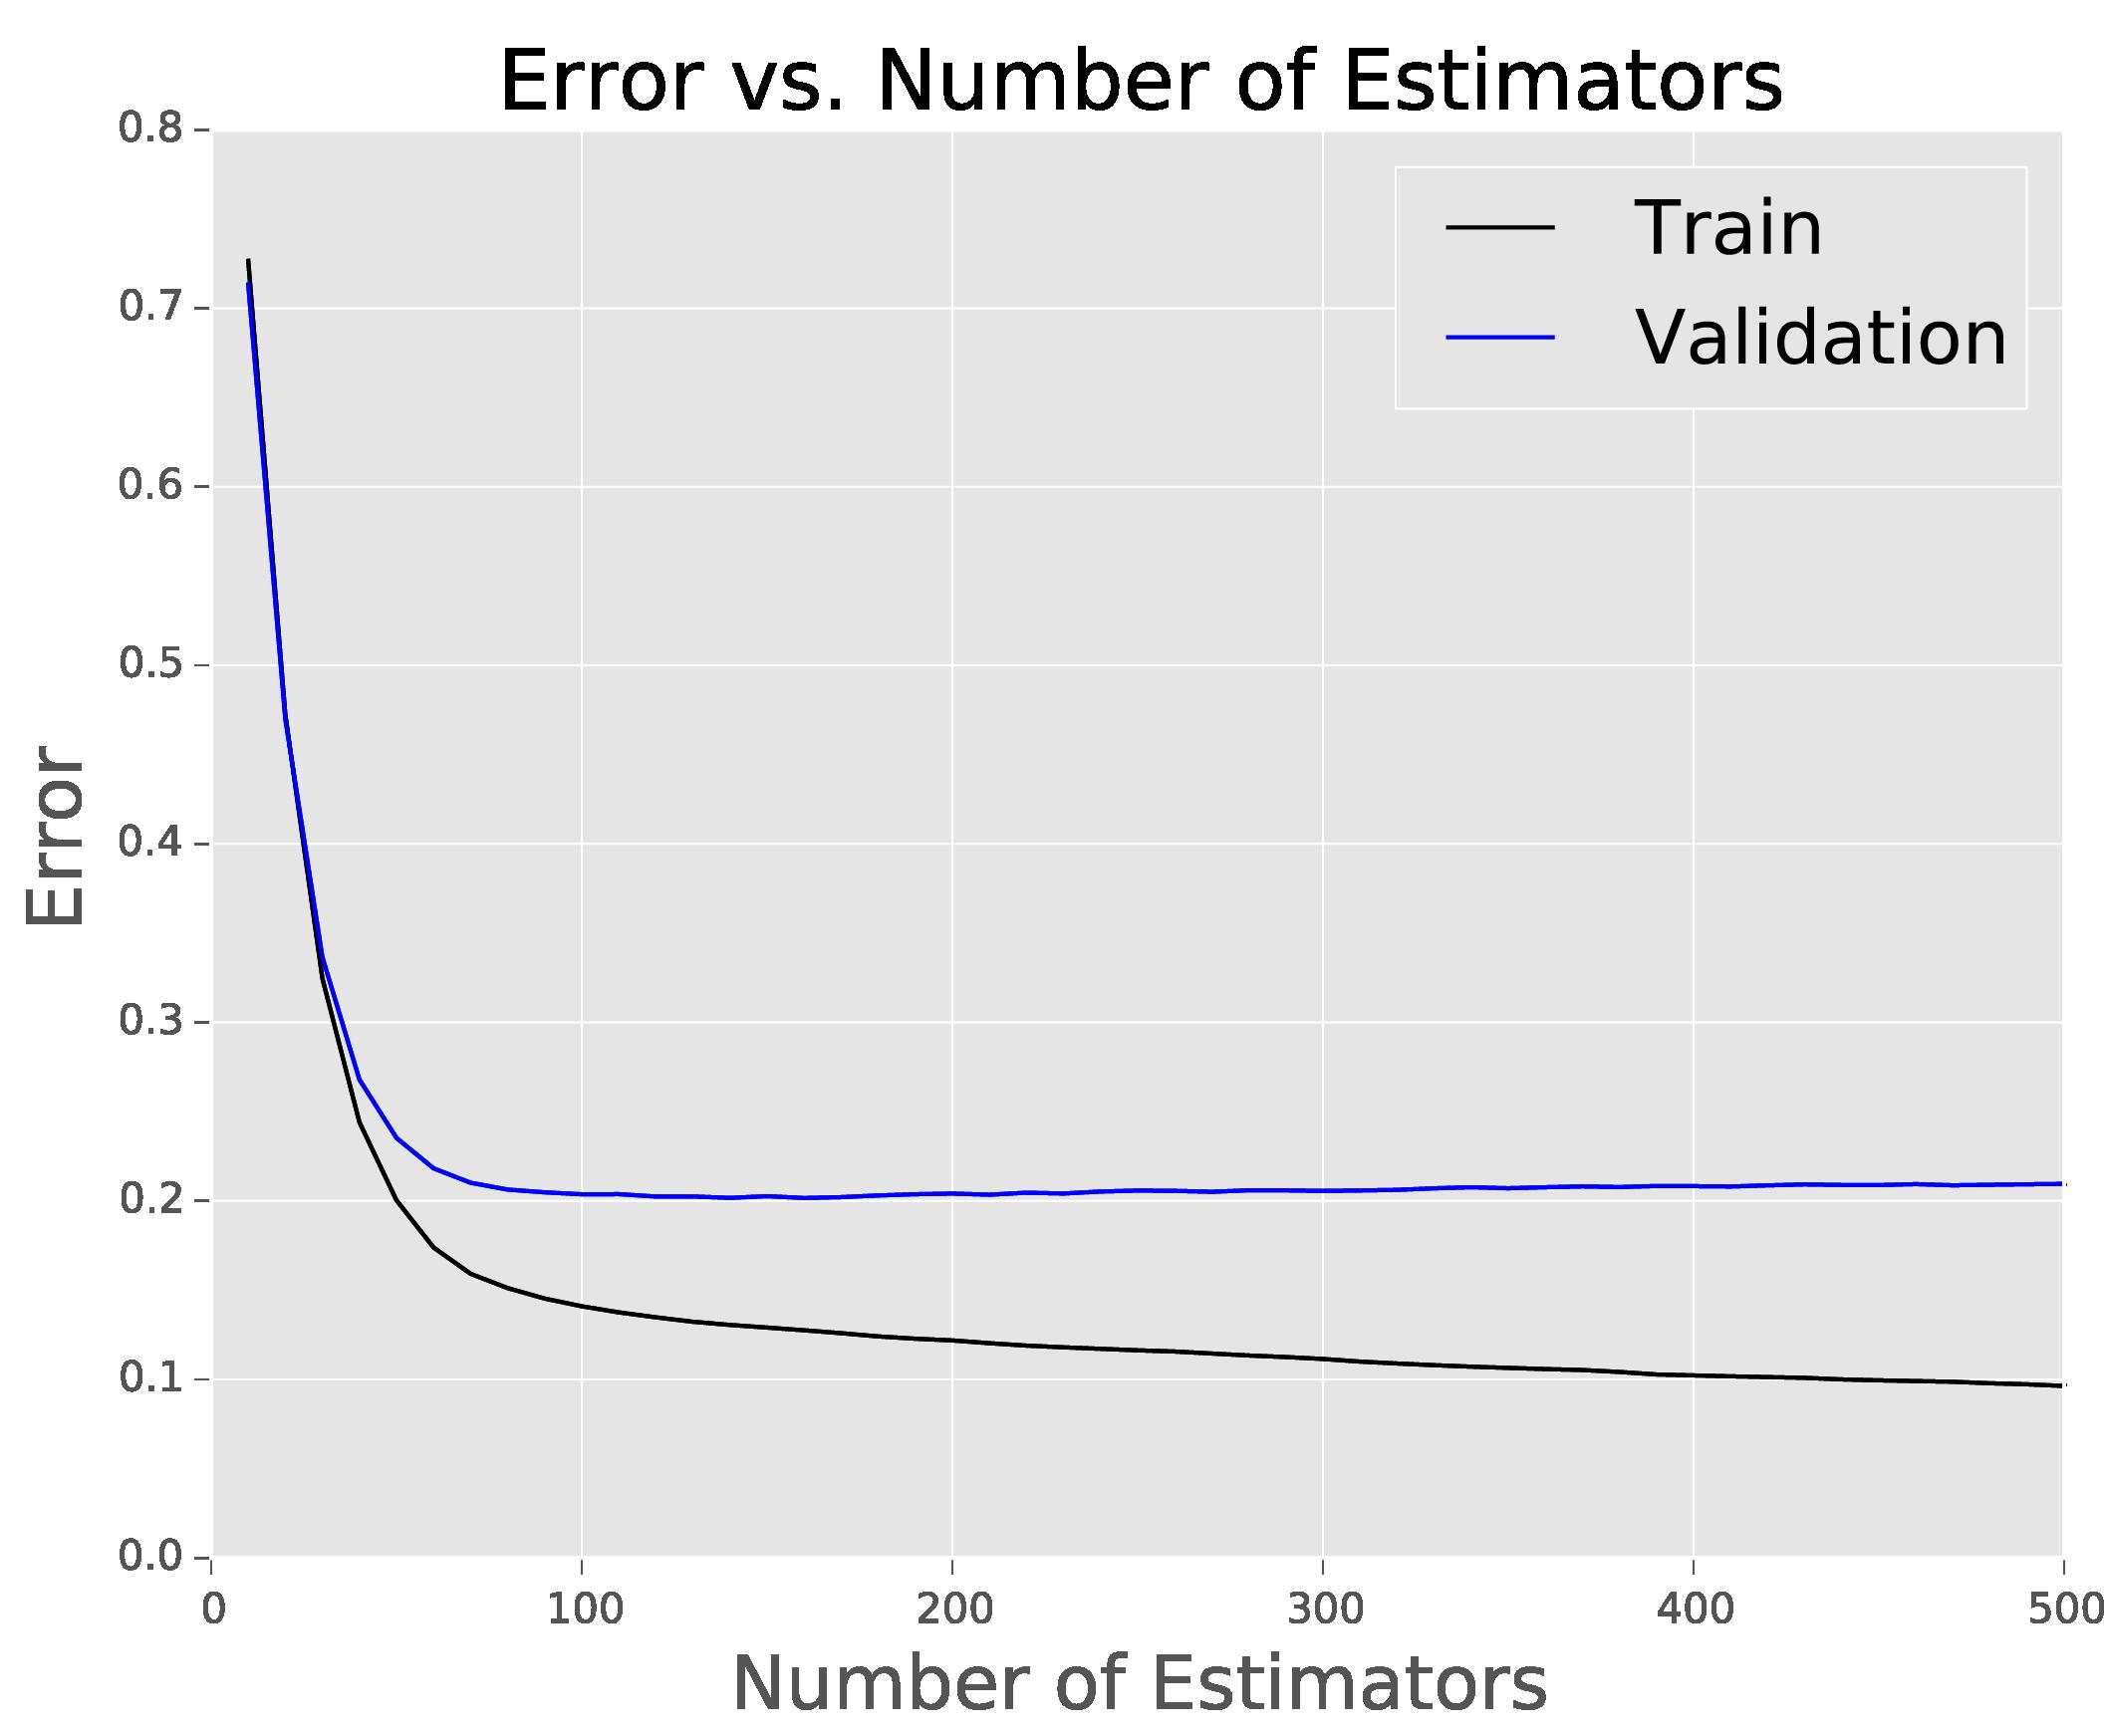 Error vs Number of Estimators